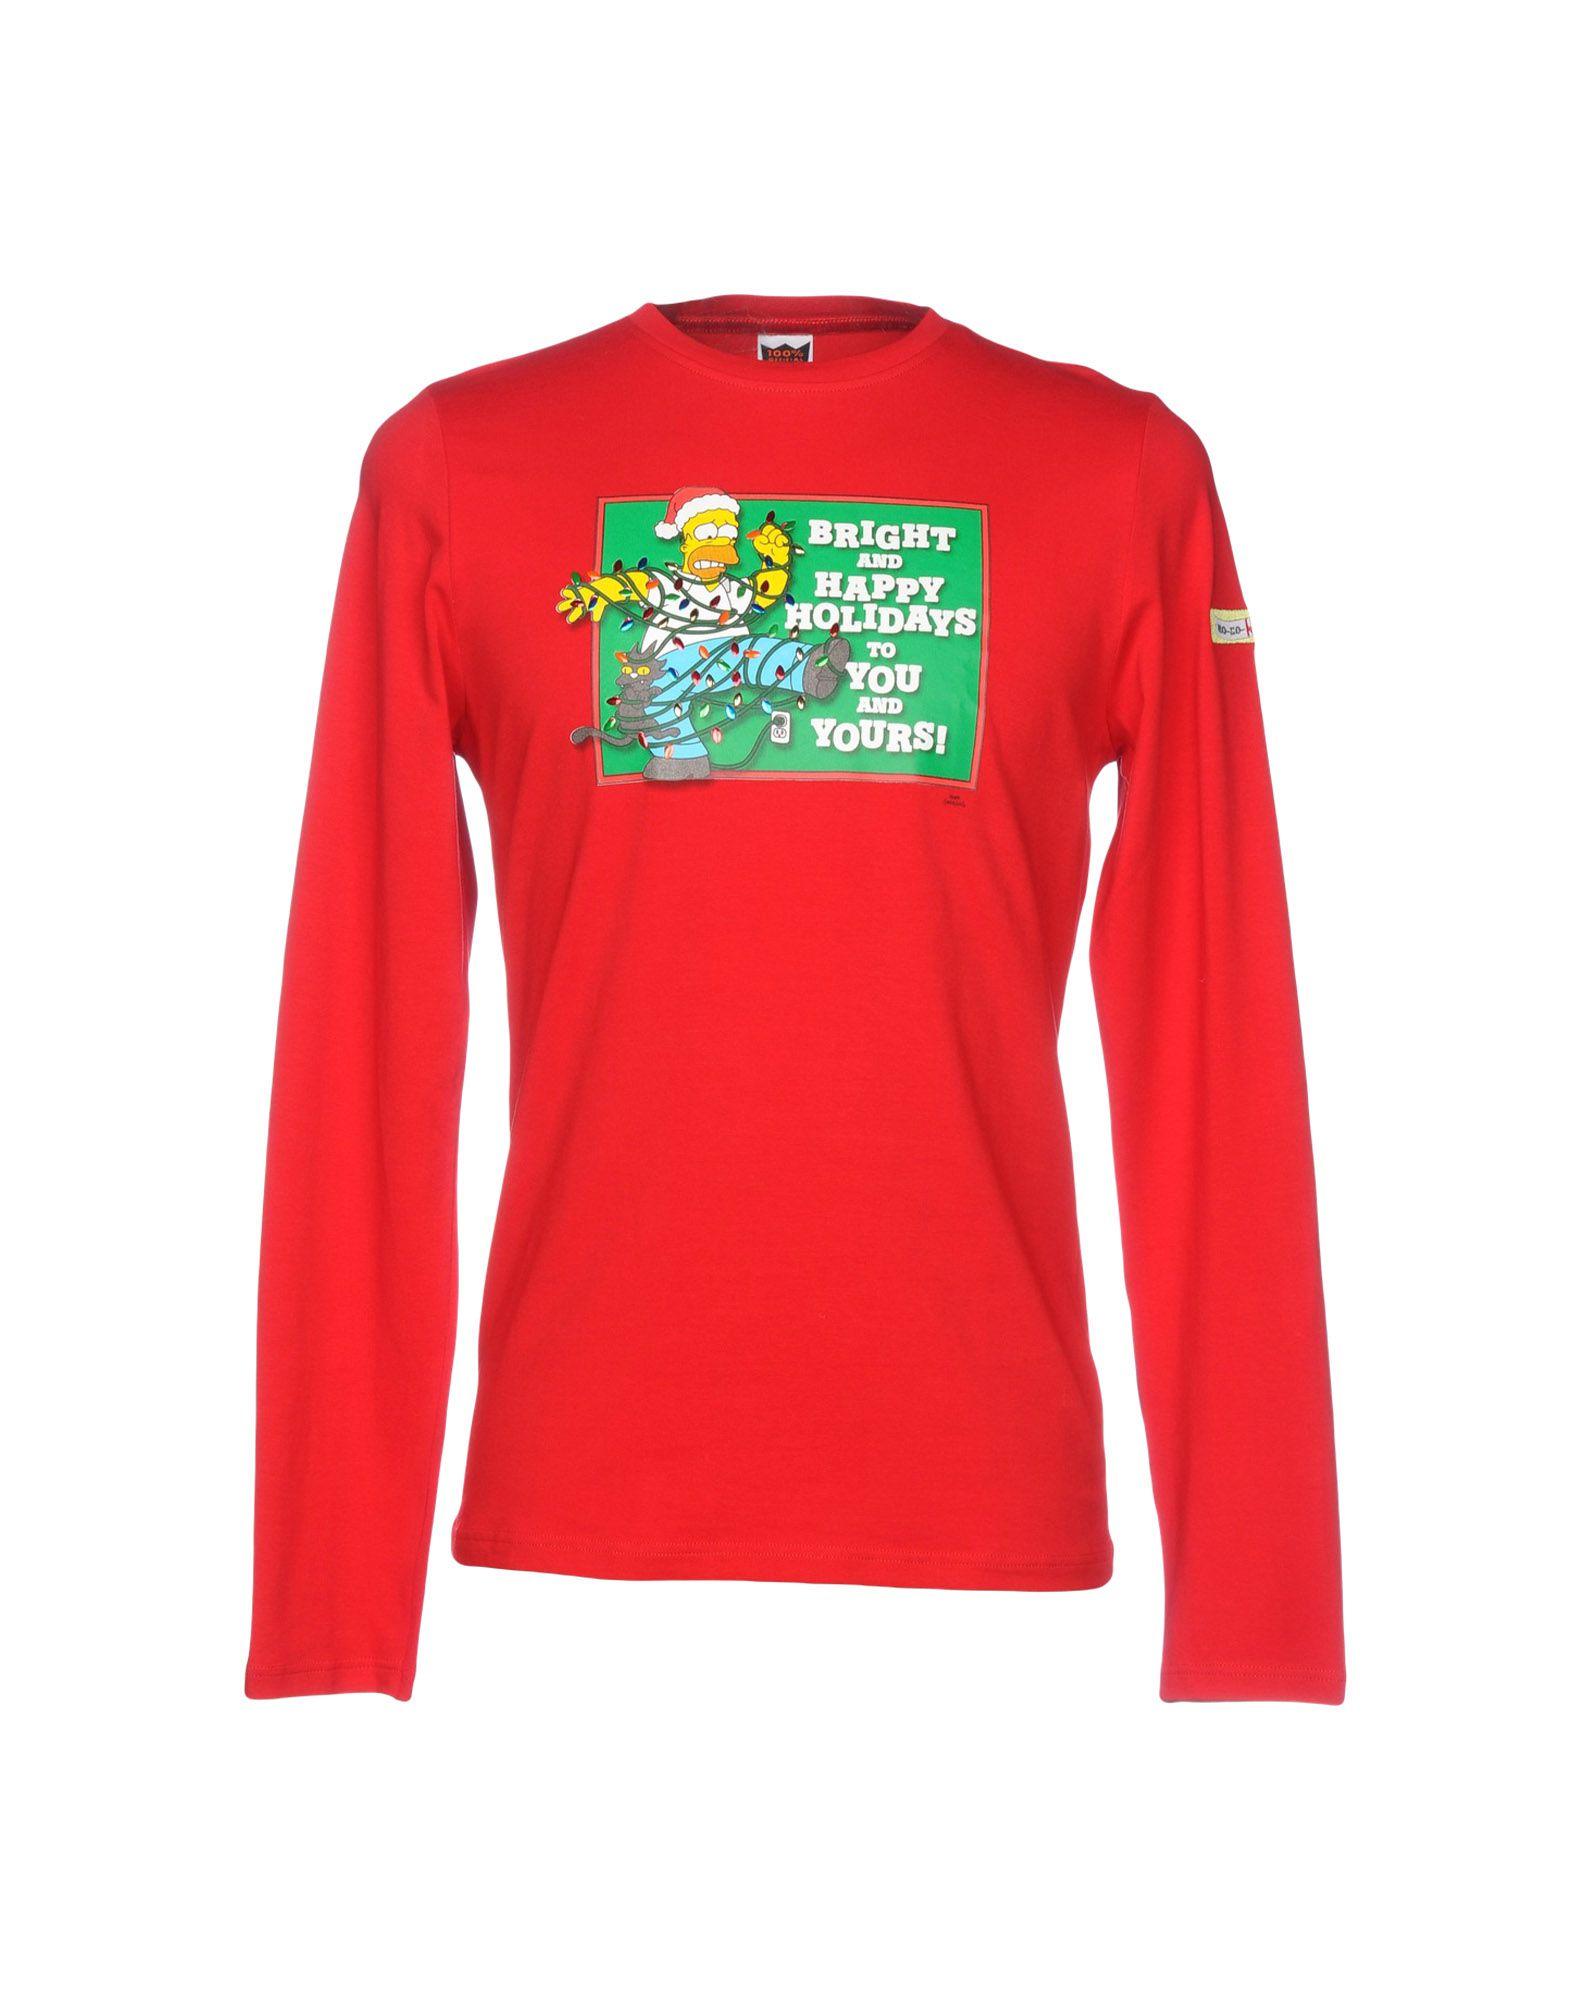 THE SIMPSONS Футболка футболка с полной запечаткой мужская printio the simpsons 1